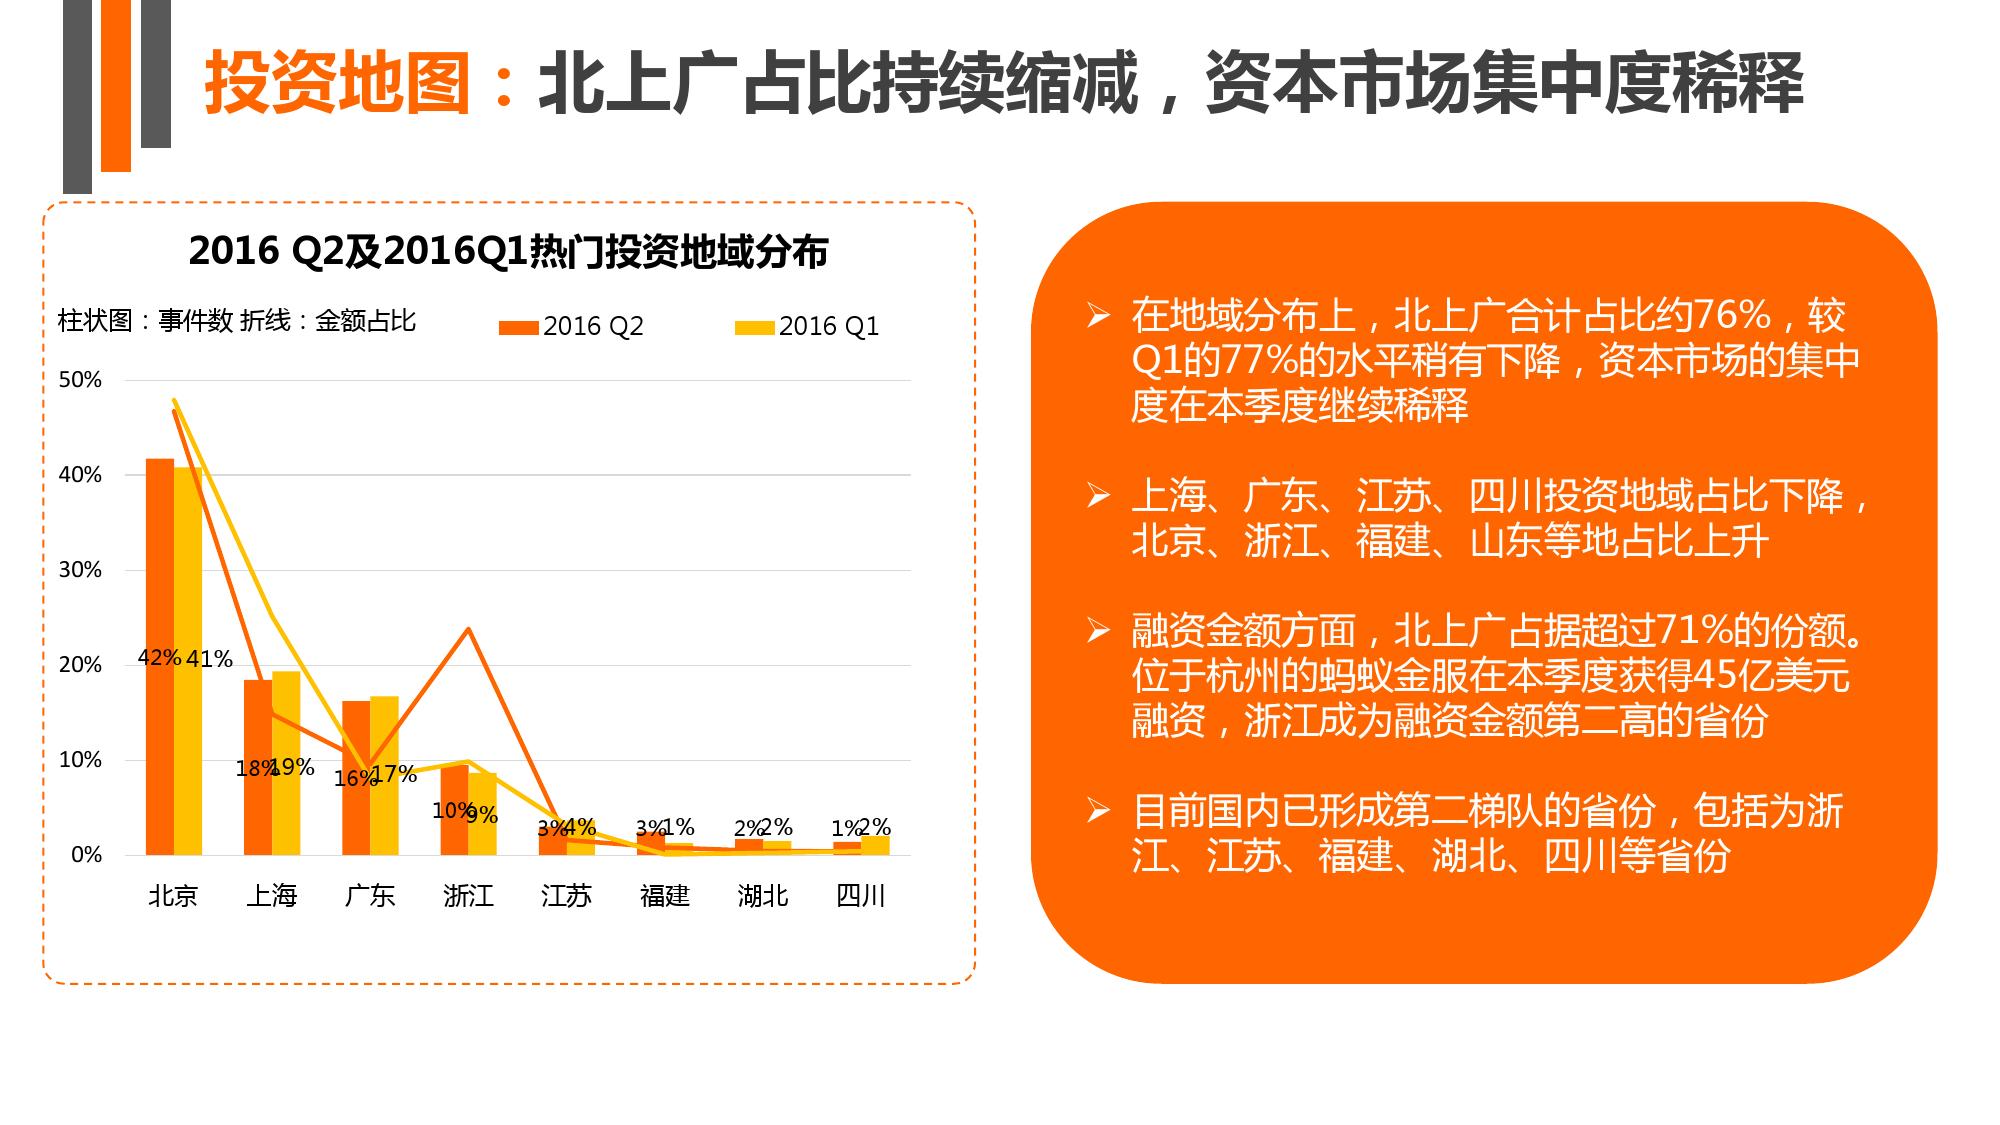 【IT桔子】2016年Q2中国互联网创业投资分析报告_000013